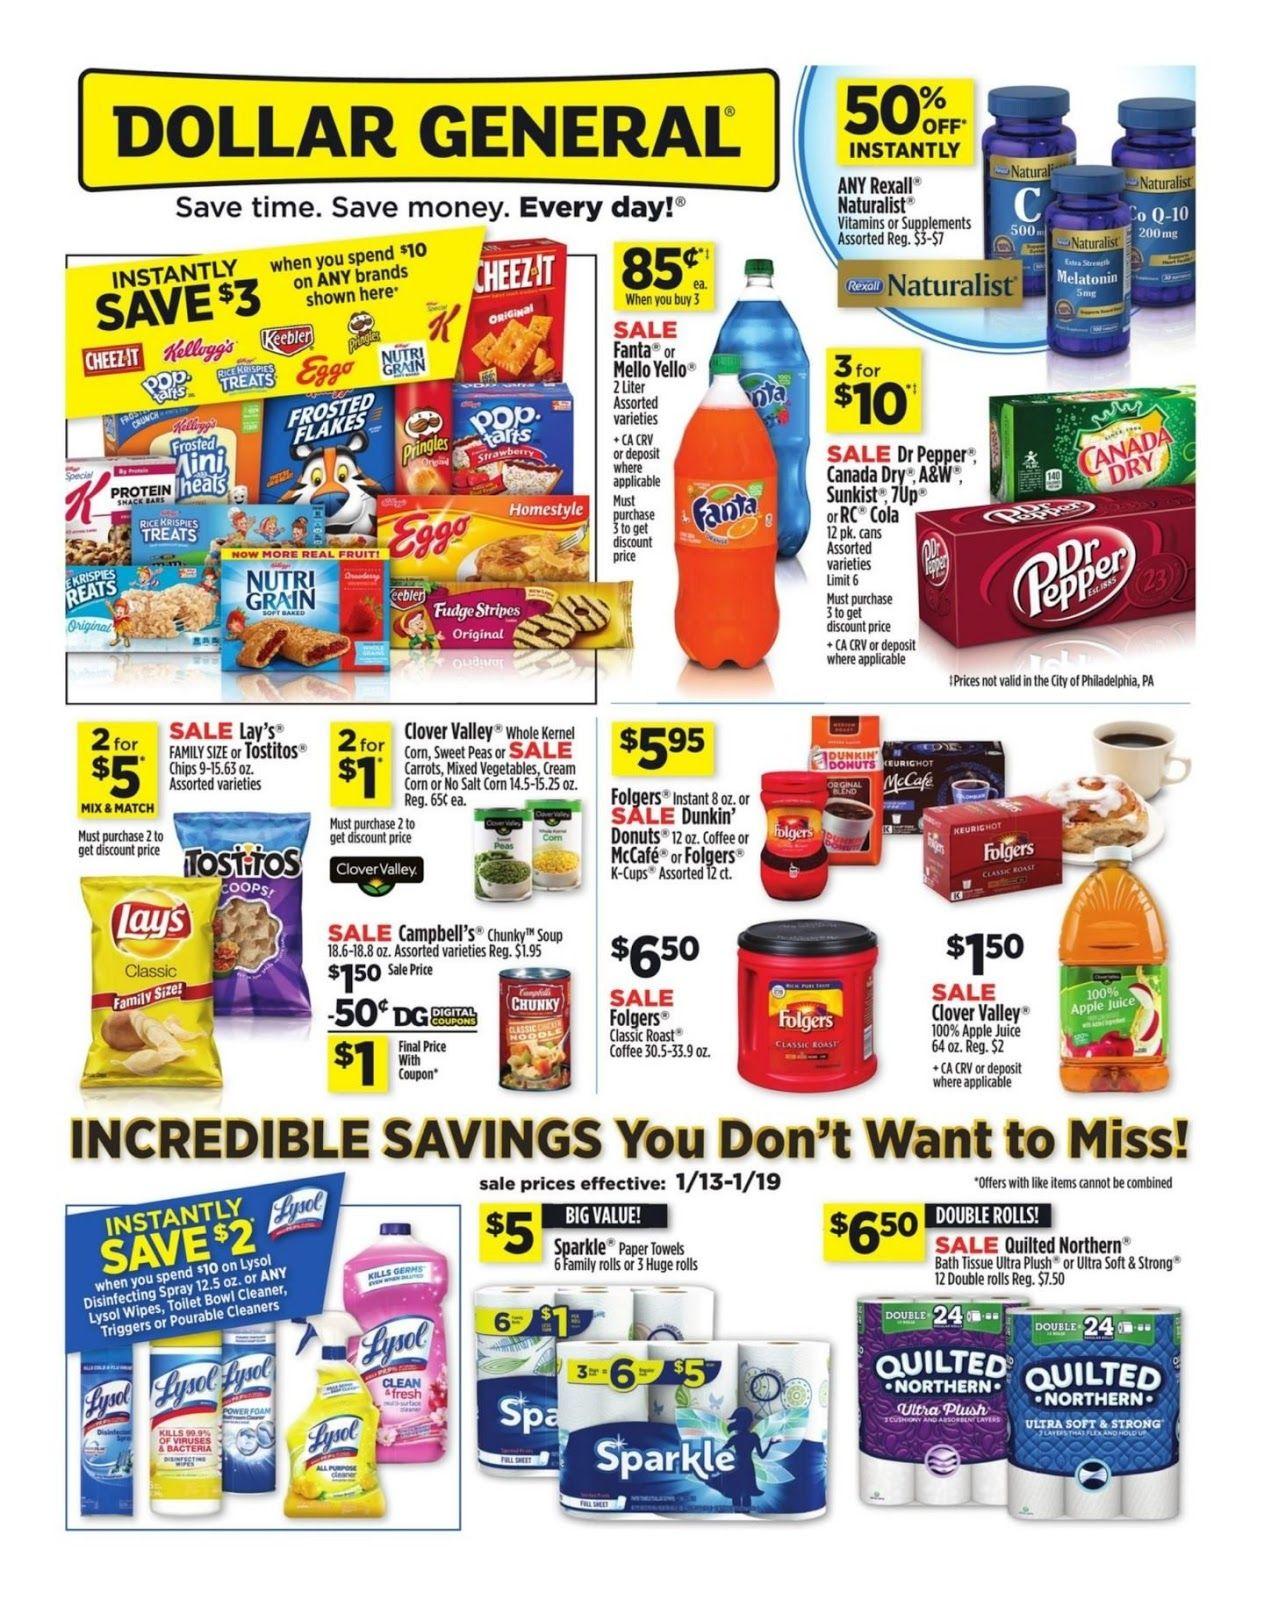 Dollar General Weekly Ad Dollar General Weekly Sale January 20